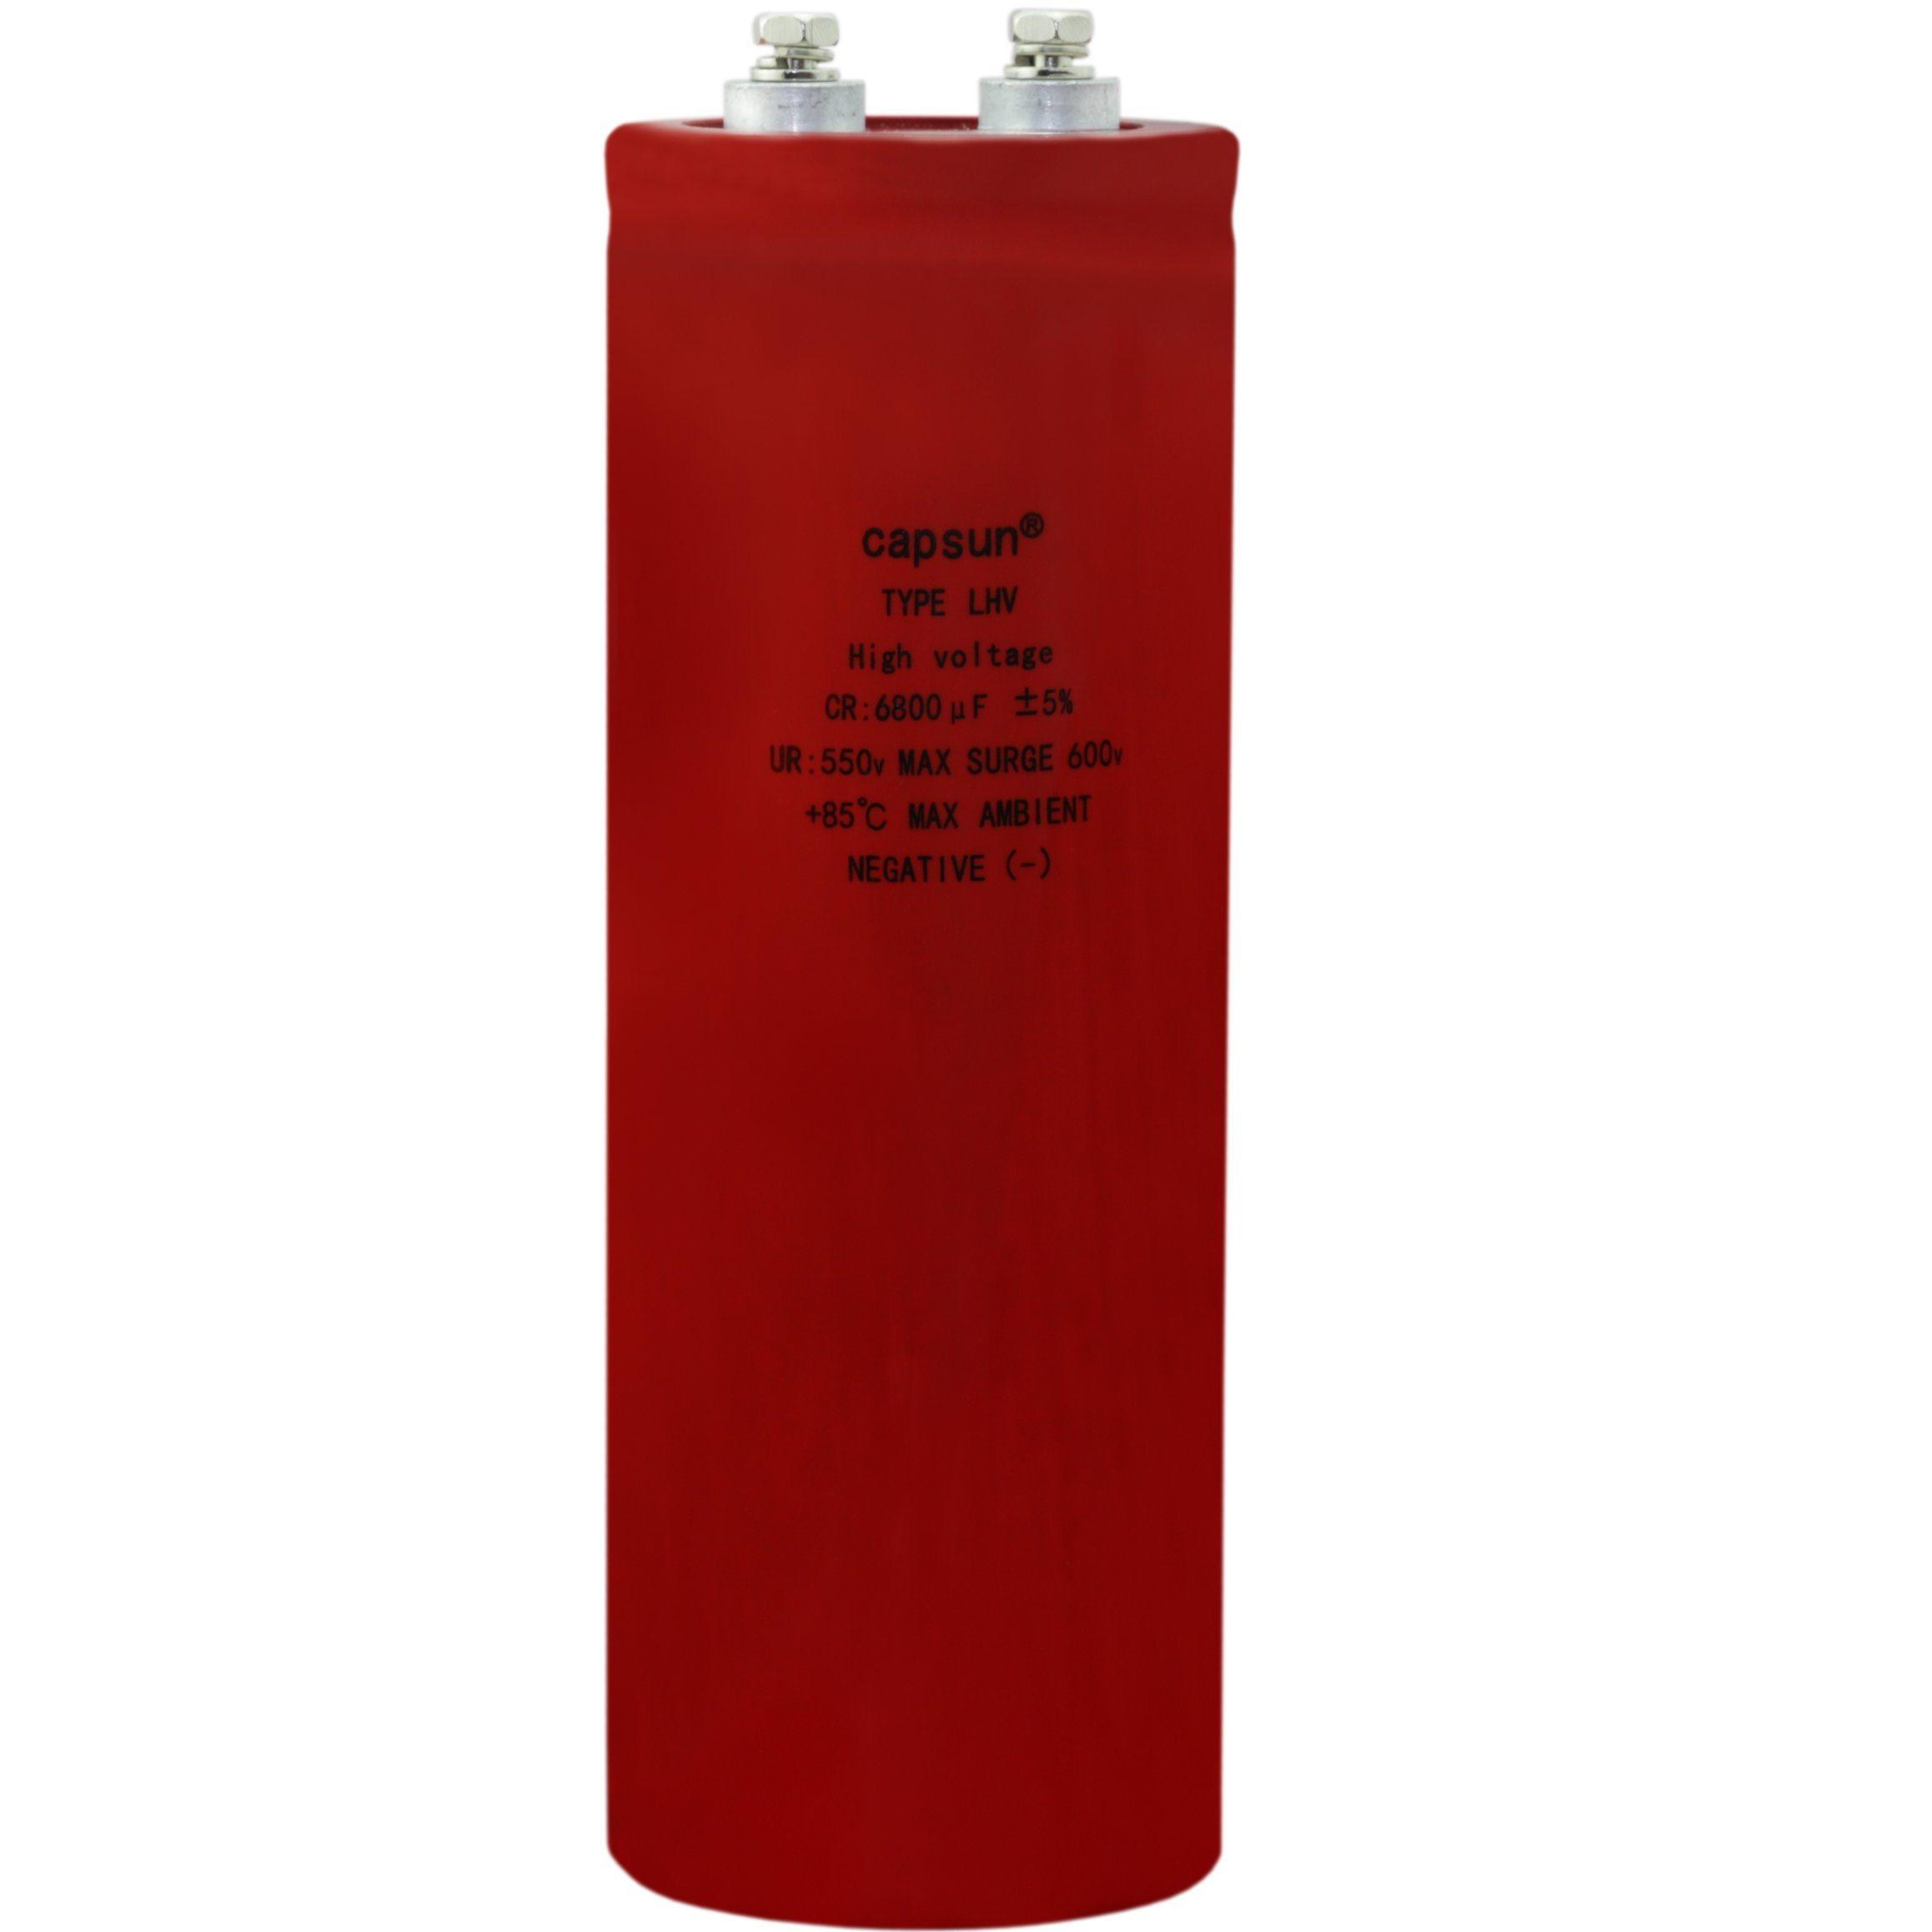 China Capacitors For Power Supply, Capacitors For Power Supply  Manufacturers, Suppliers, Price | Made-in-China com